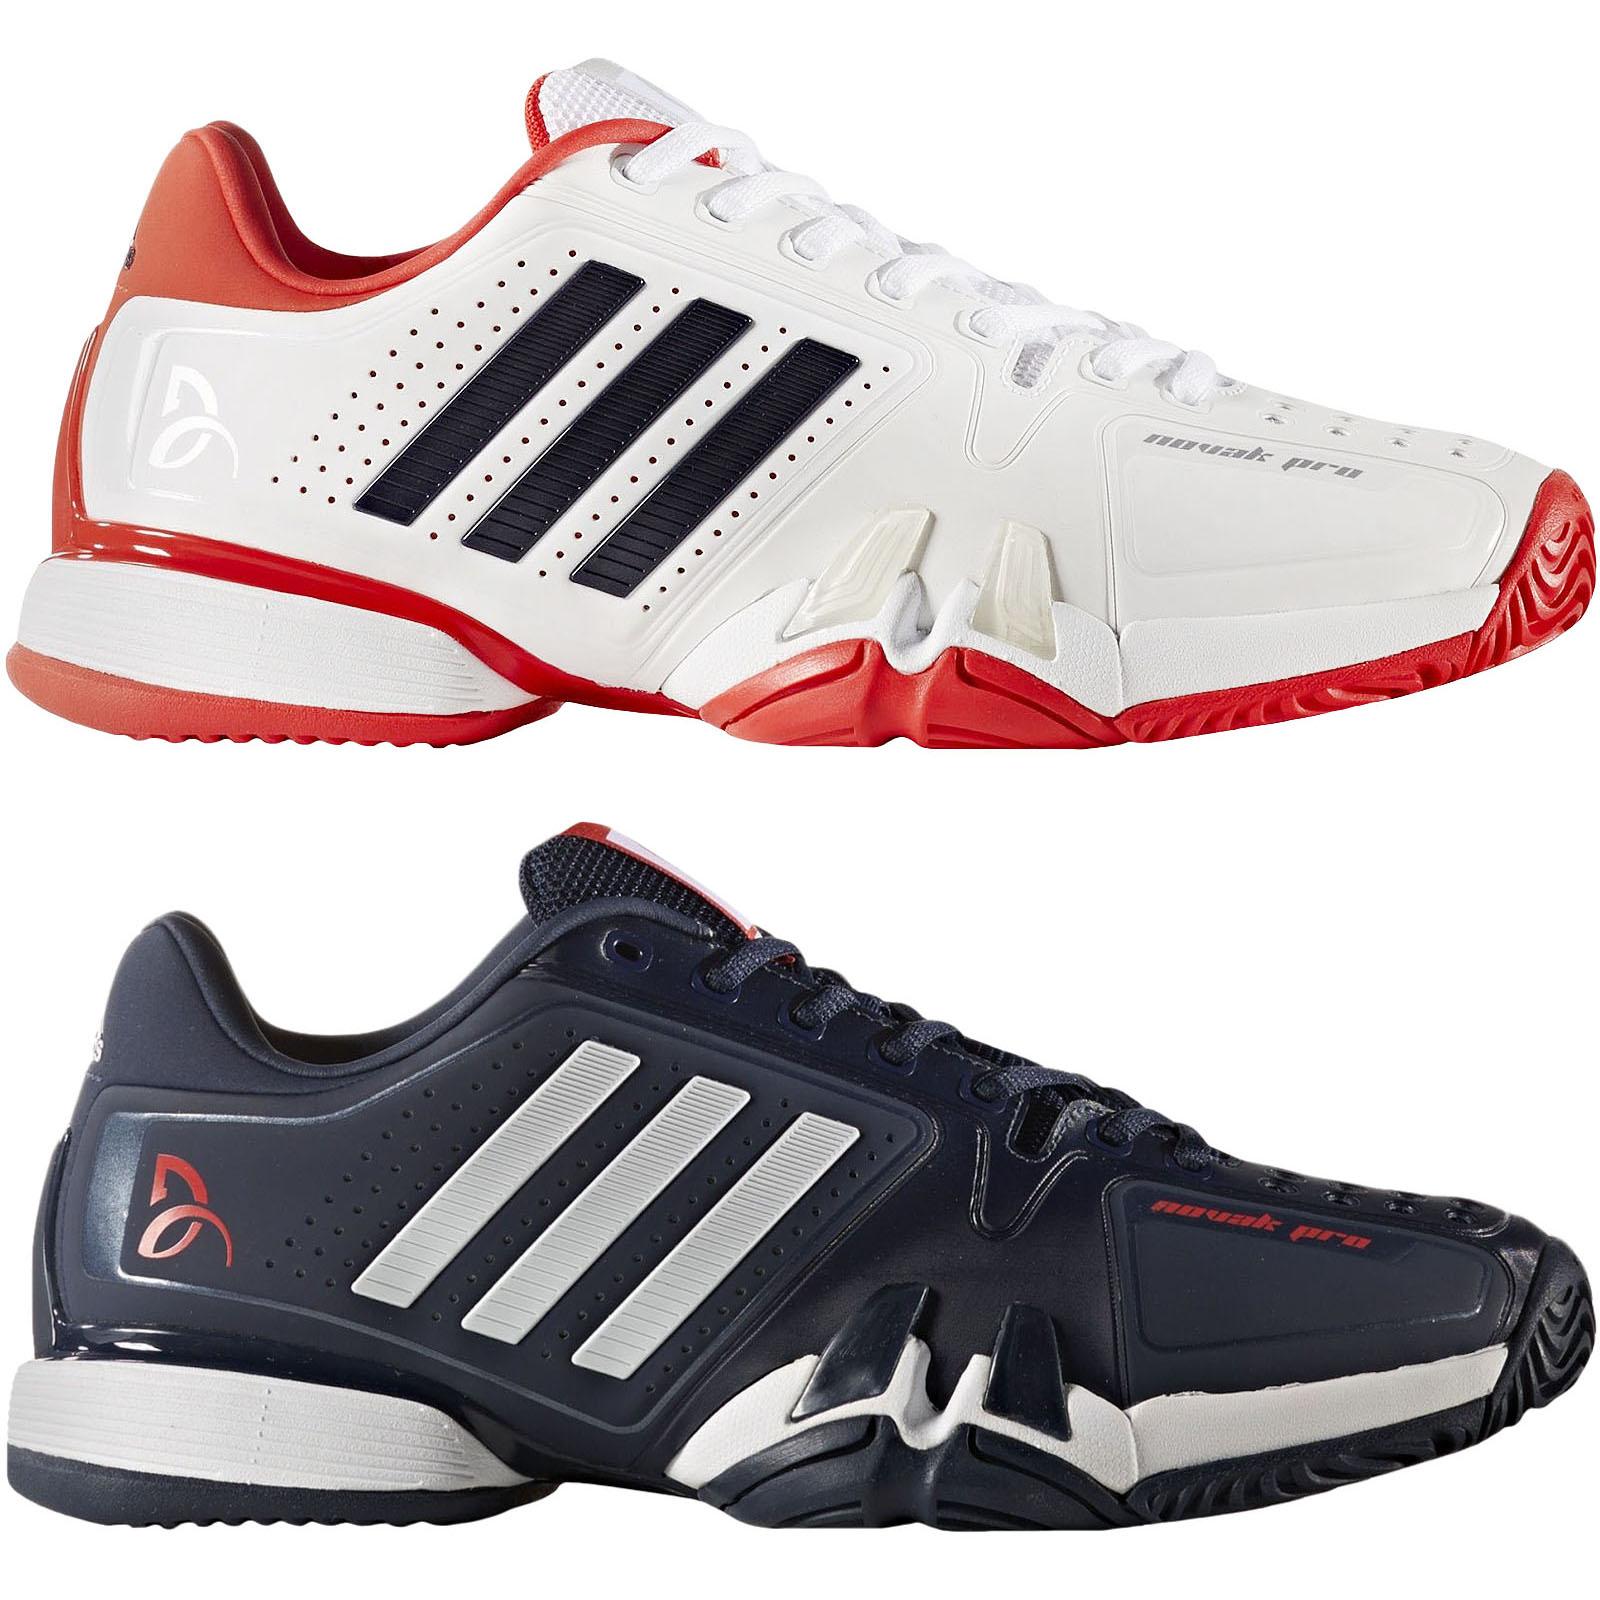 6df8d8906f3 Details about adidas Performance Mens Novak Pro Court Sports Tennis  Trainers Shoes